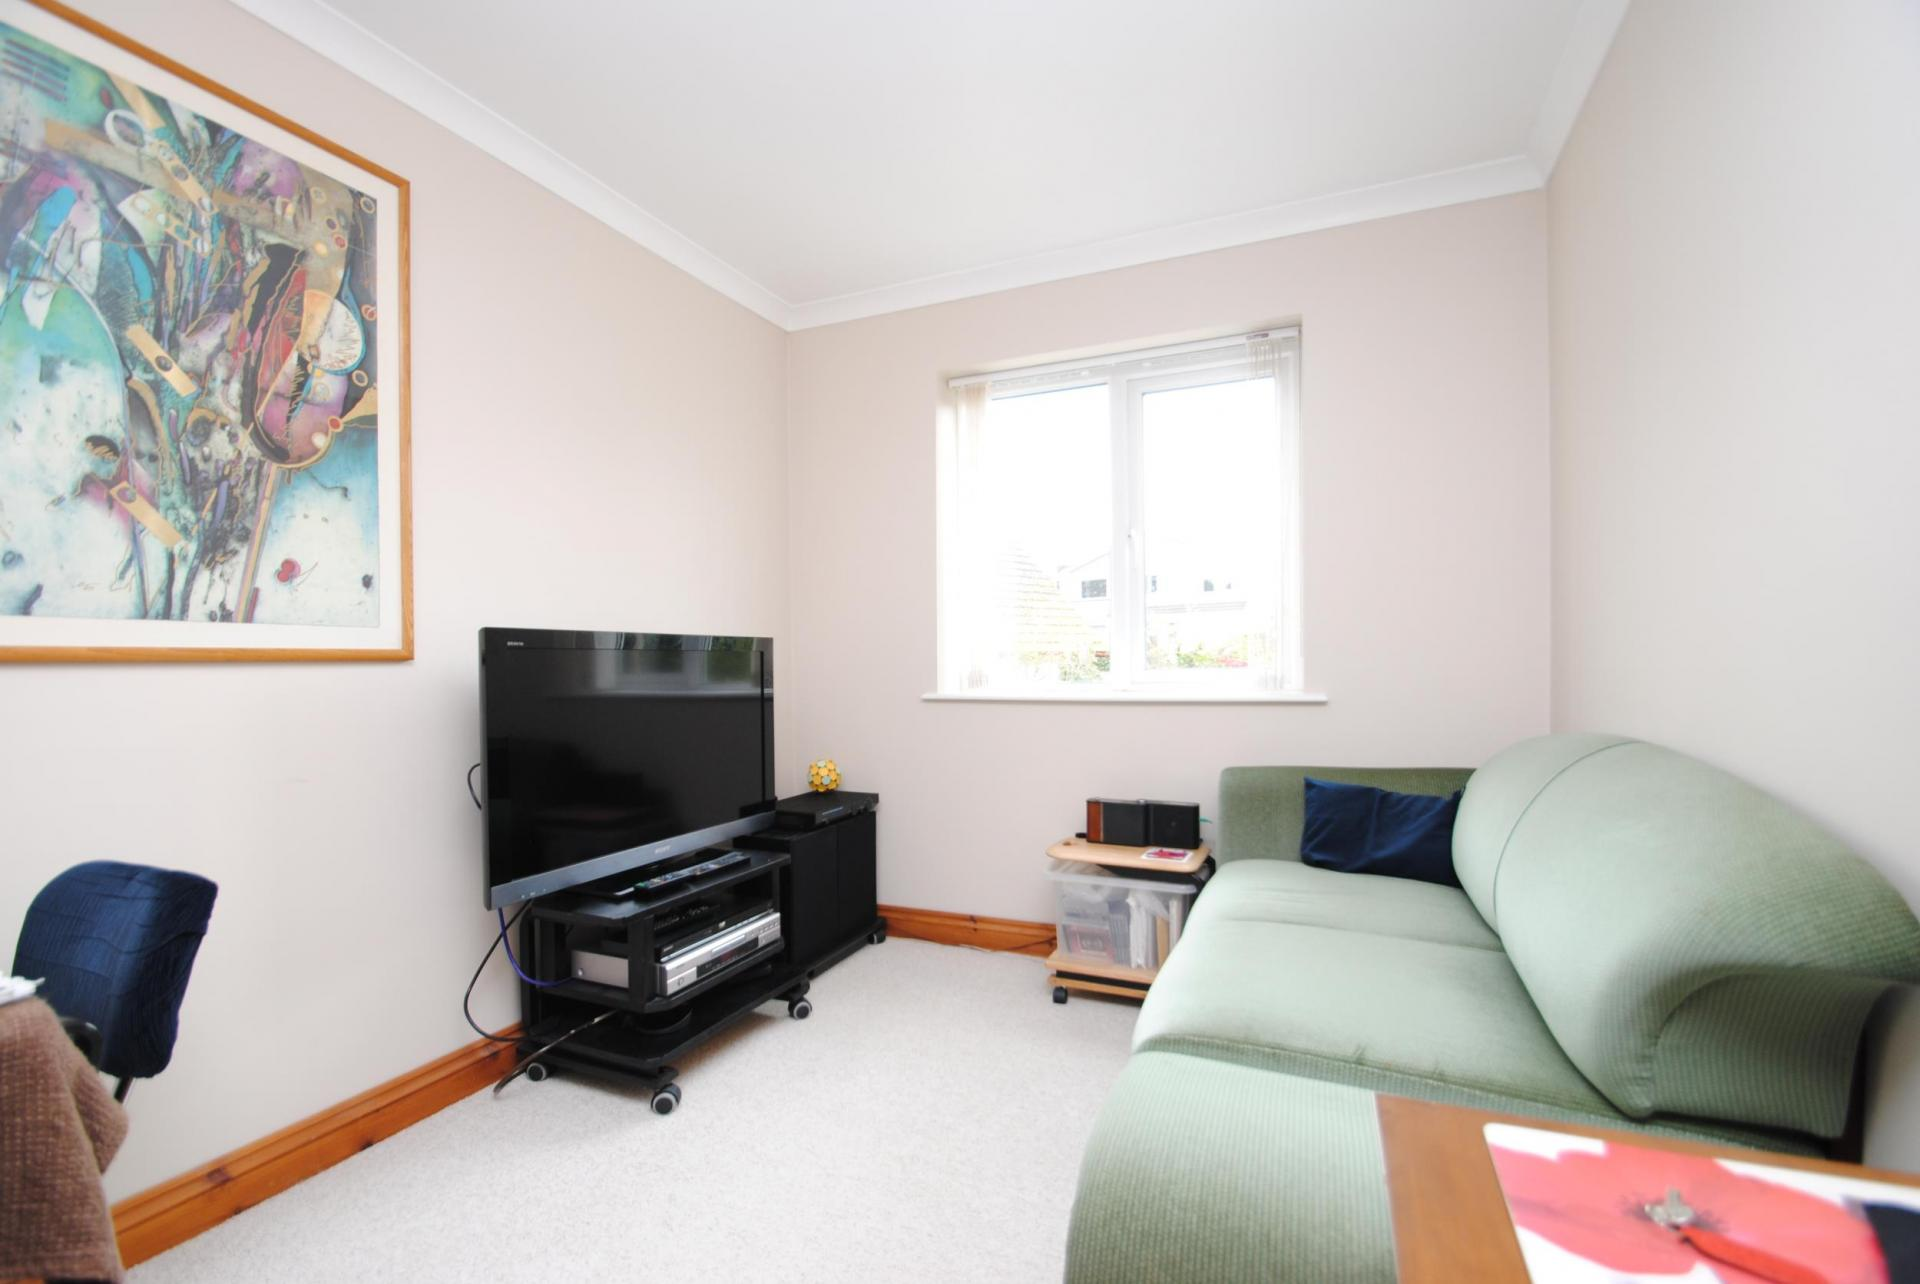 2 Bedroom Apartments Launceston 28 Images 2 Bedroom Apartment To Rent In Launceston